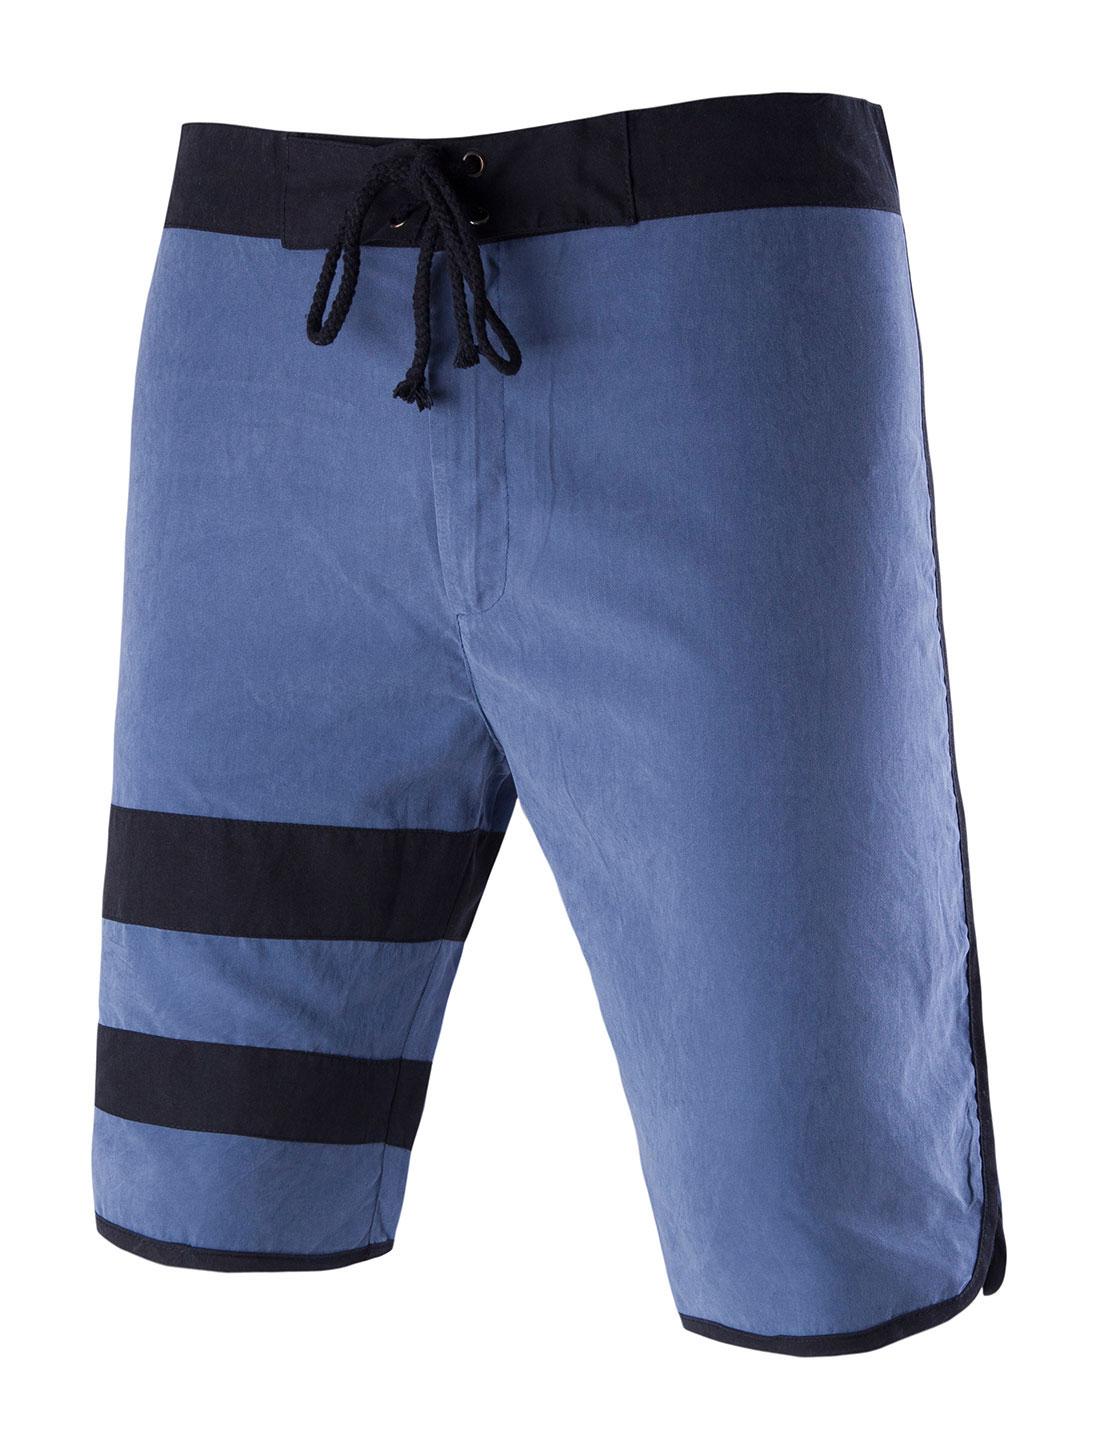 Men Flap Pockets Back Casual Stripes Shorts Blue W30